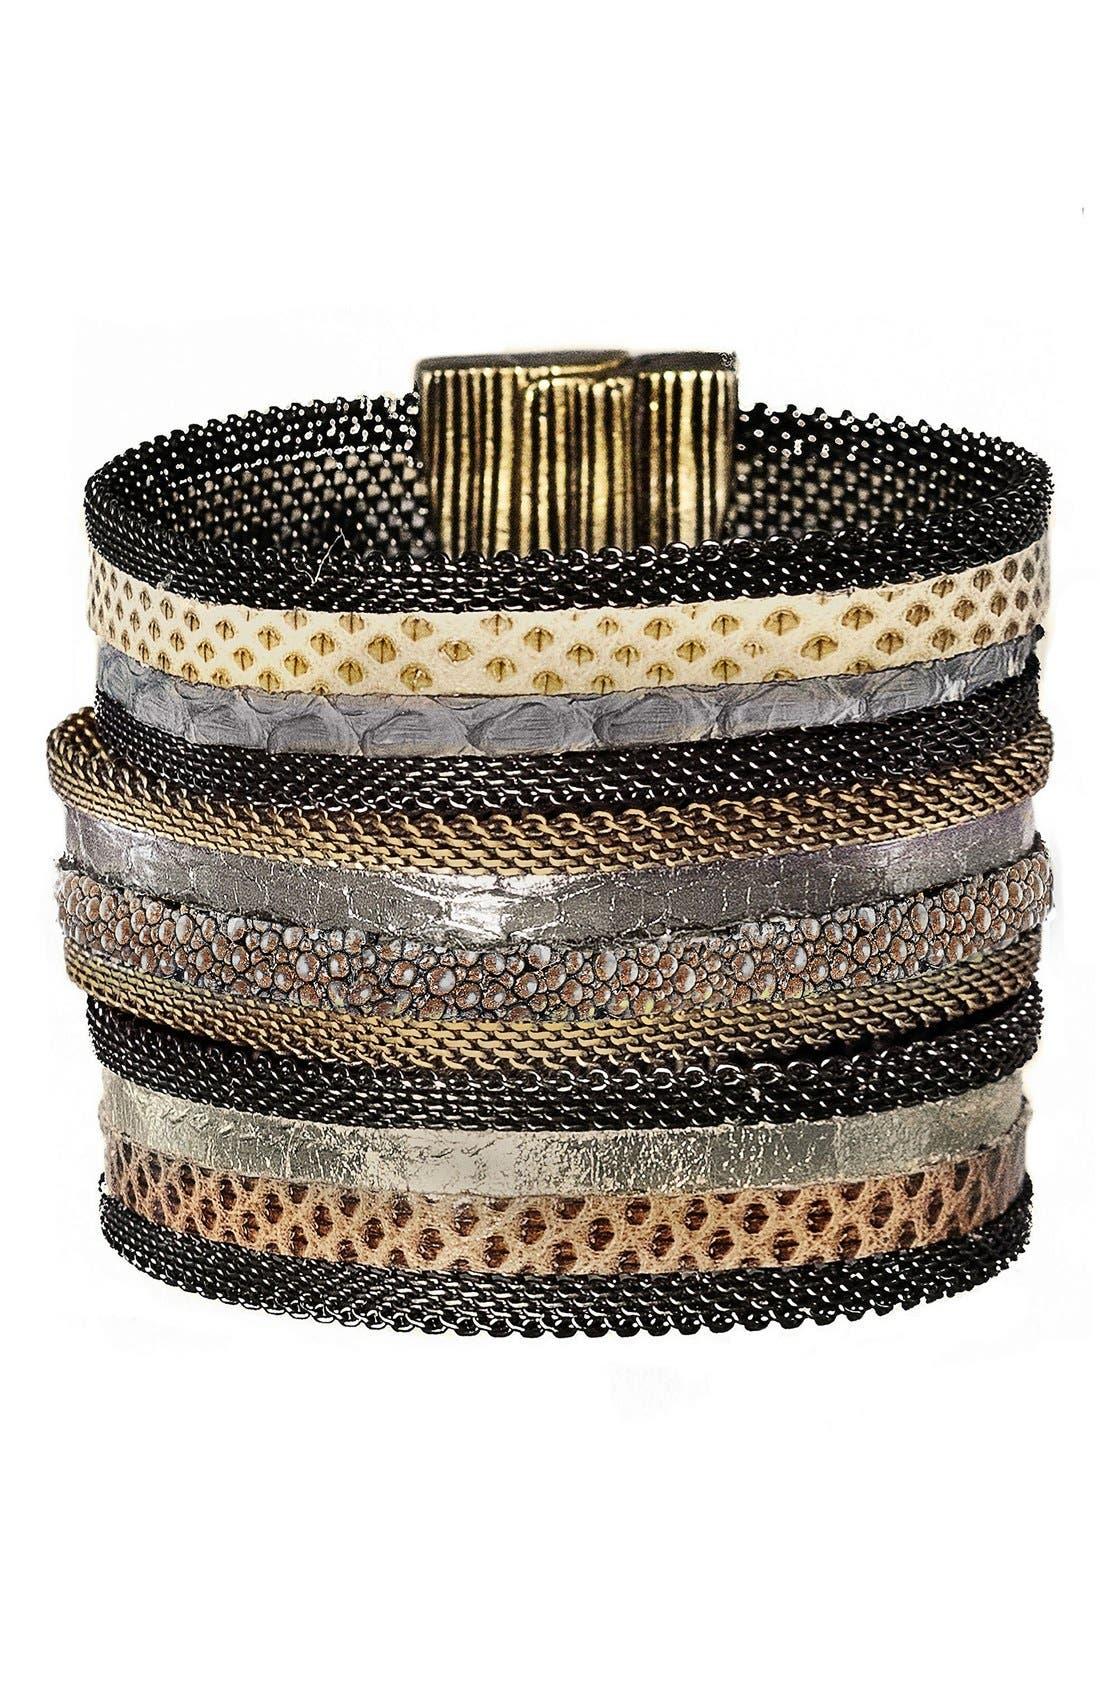 CYNTHIA DESSER Genuine Snakeskin & Stingray Skin Wrist